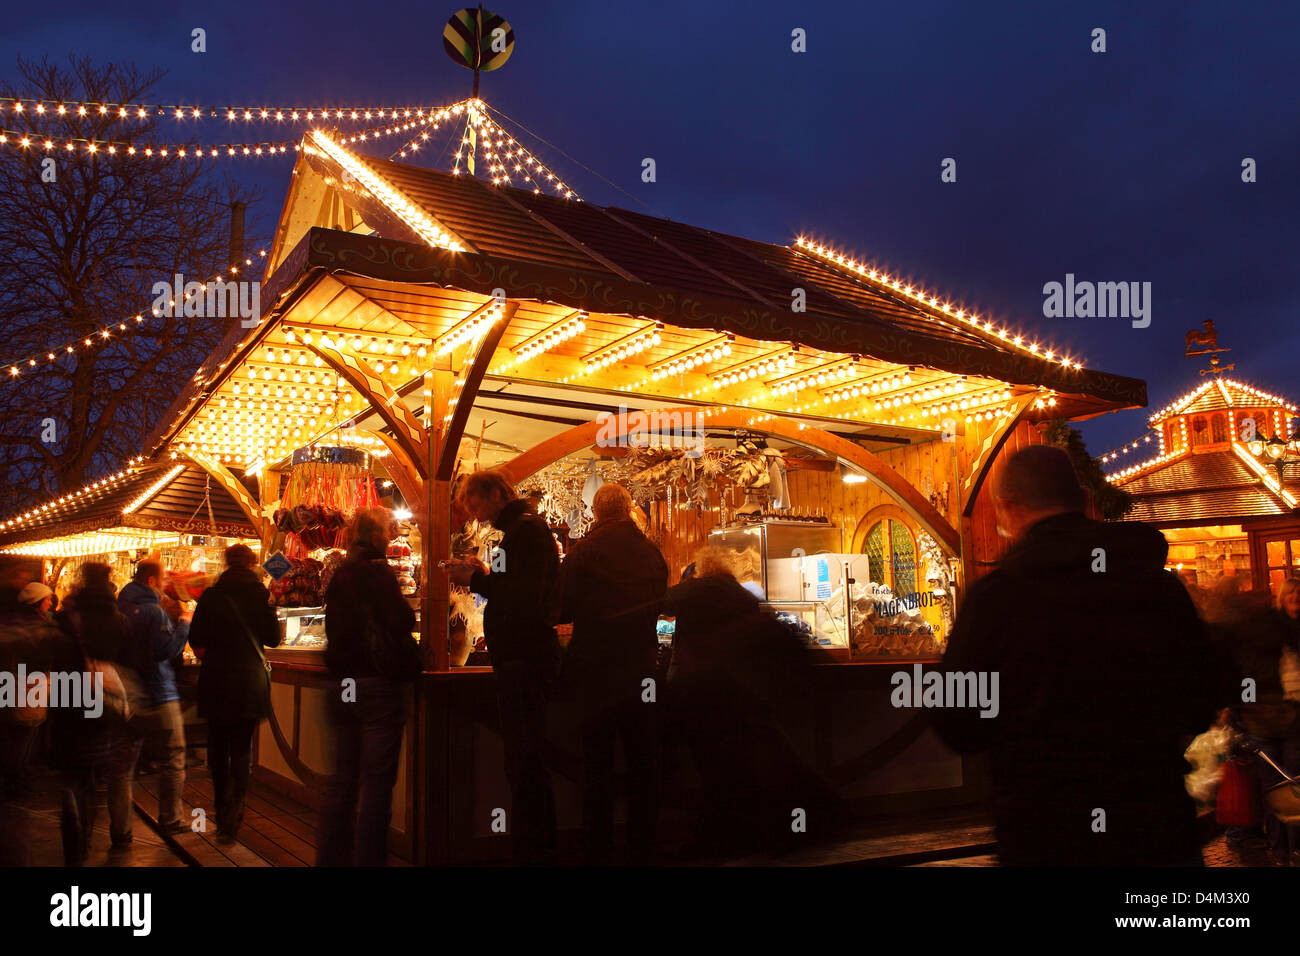 People meet around an illuminated stall at the Christmas Market (Weihnachtsmarkt) in Stuttgart, Germany. - Stock Image